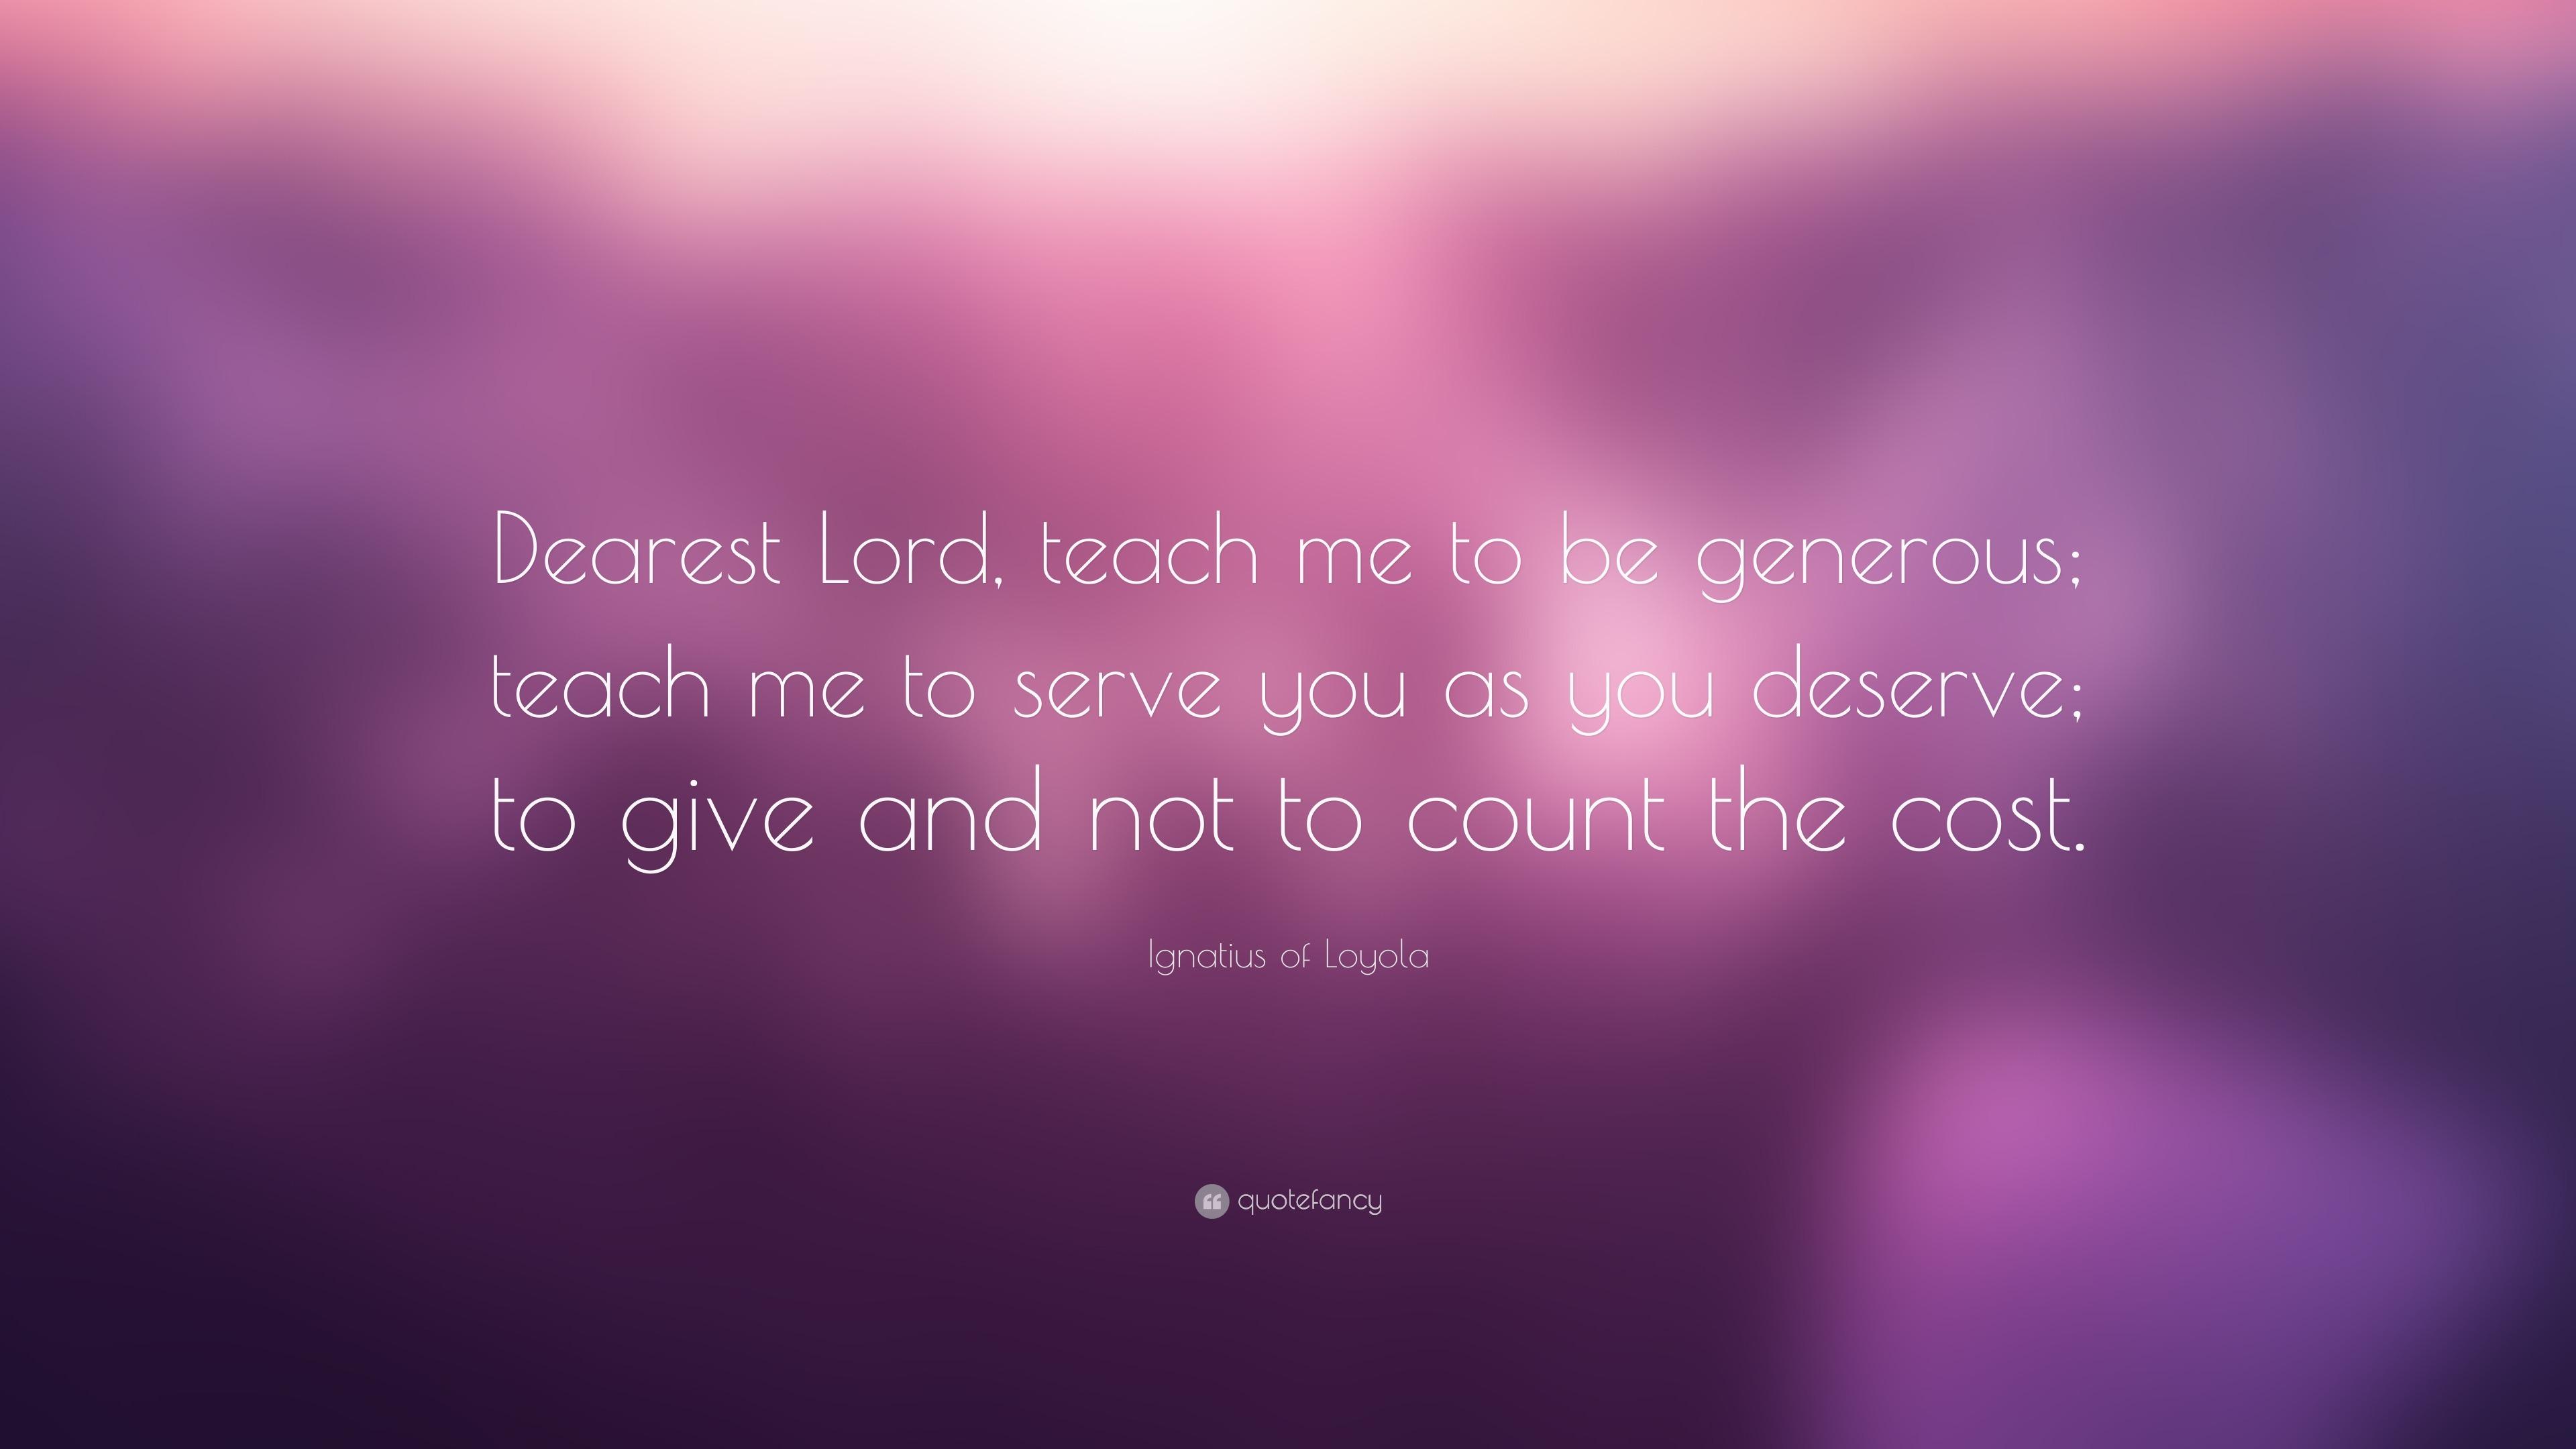 Bukas Palad - Prayer for Generosity Lyrics | Musixmatch